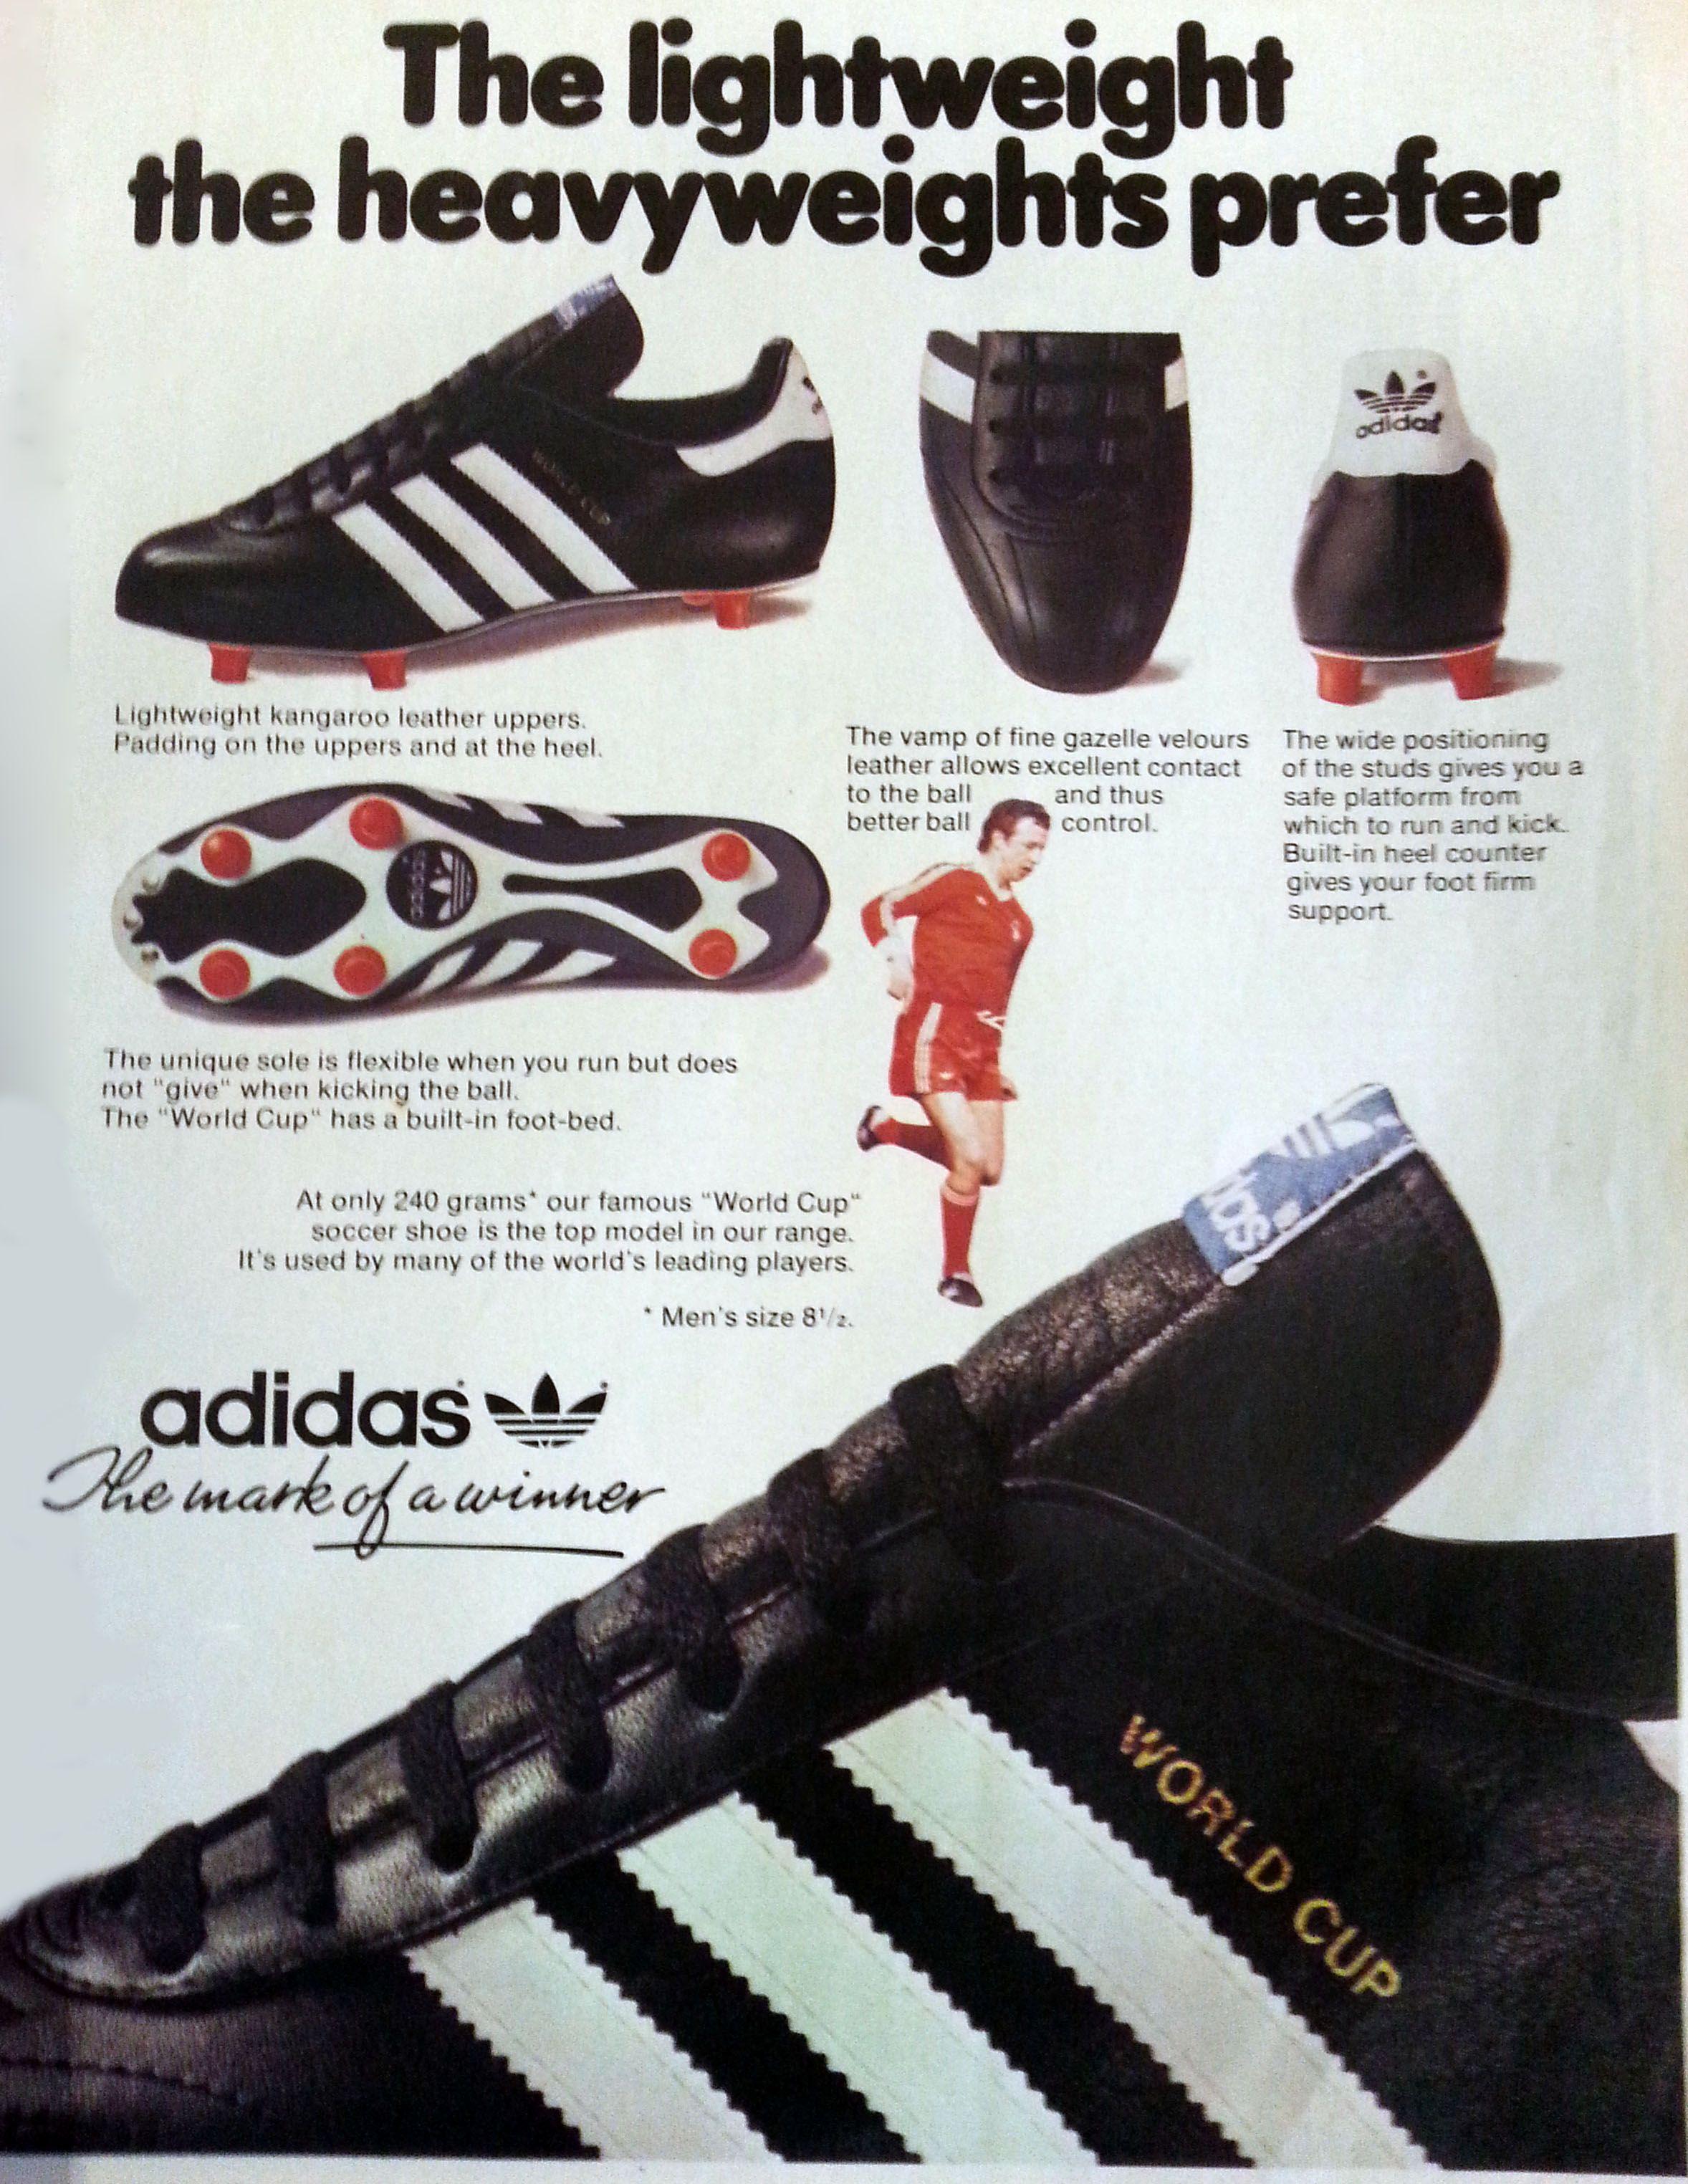 old nike football adverts - Google Search | ADIDAS ADI ...